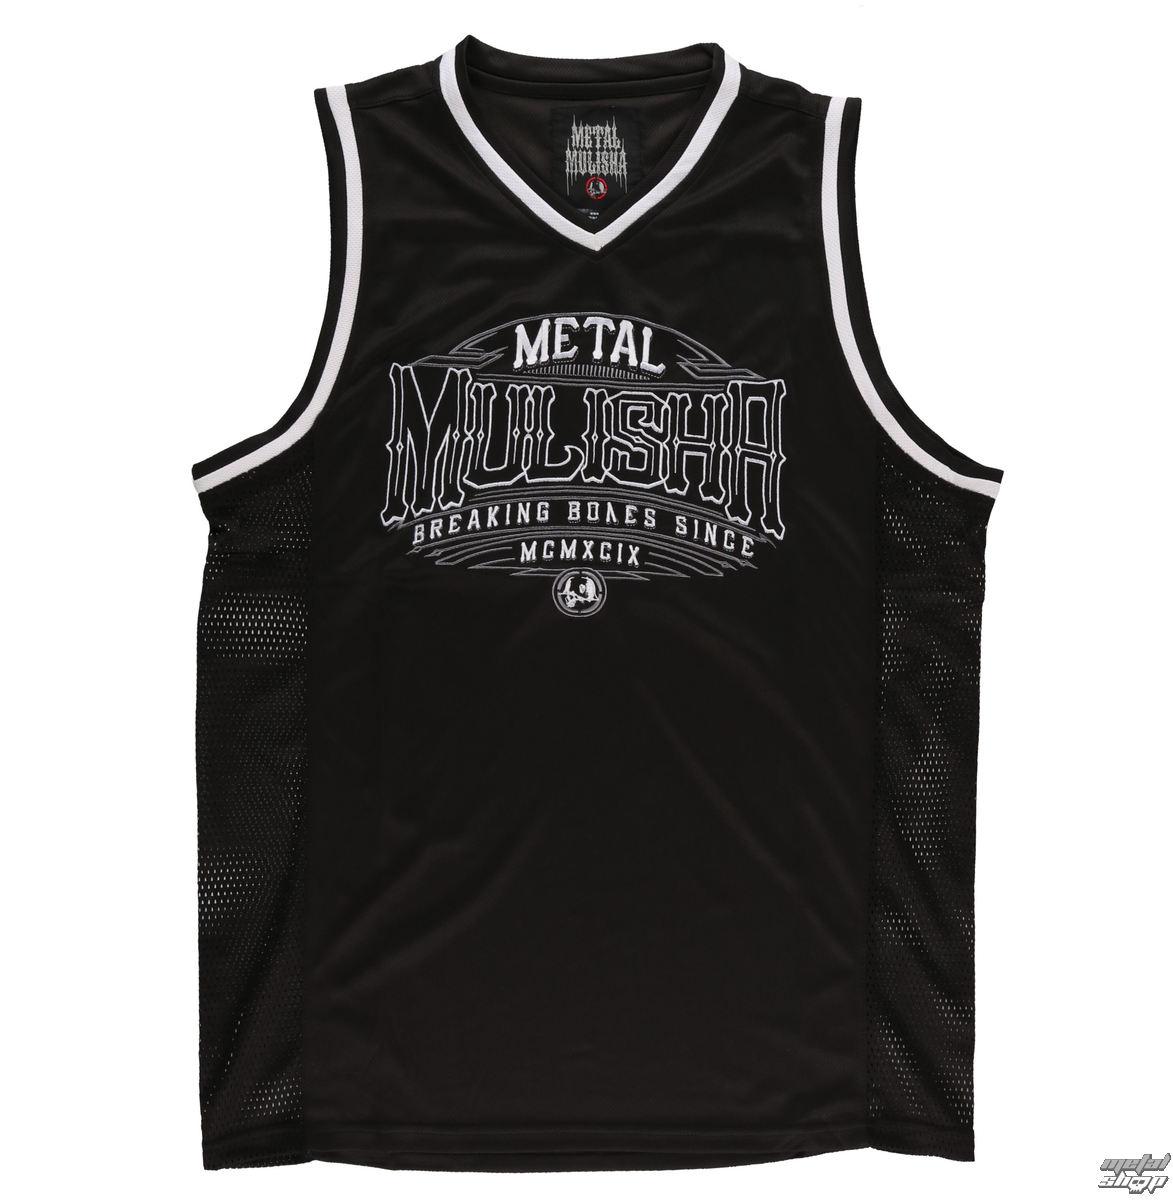 "Metal Mulisha Men/'s Jersey Tank Top /""Direct/'/'--Black"